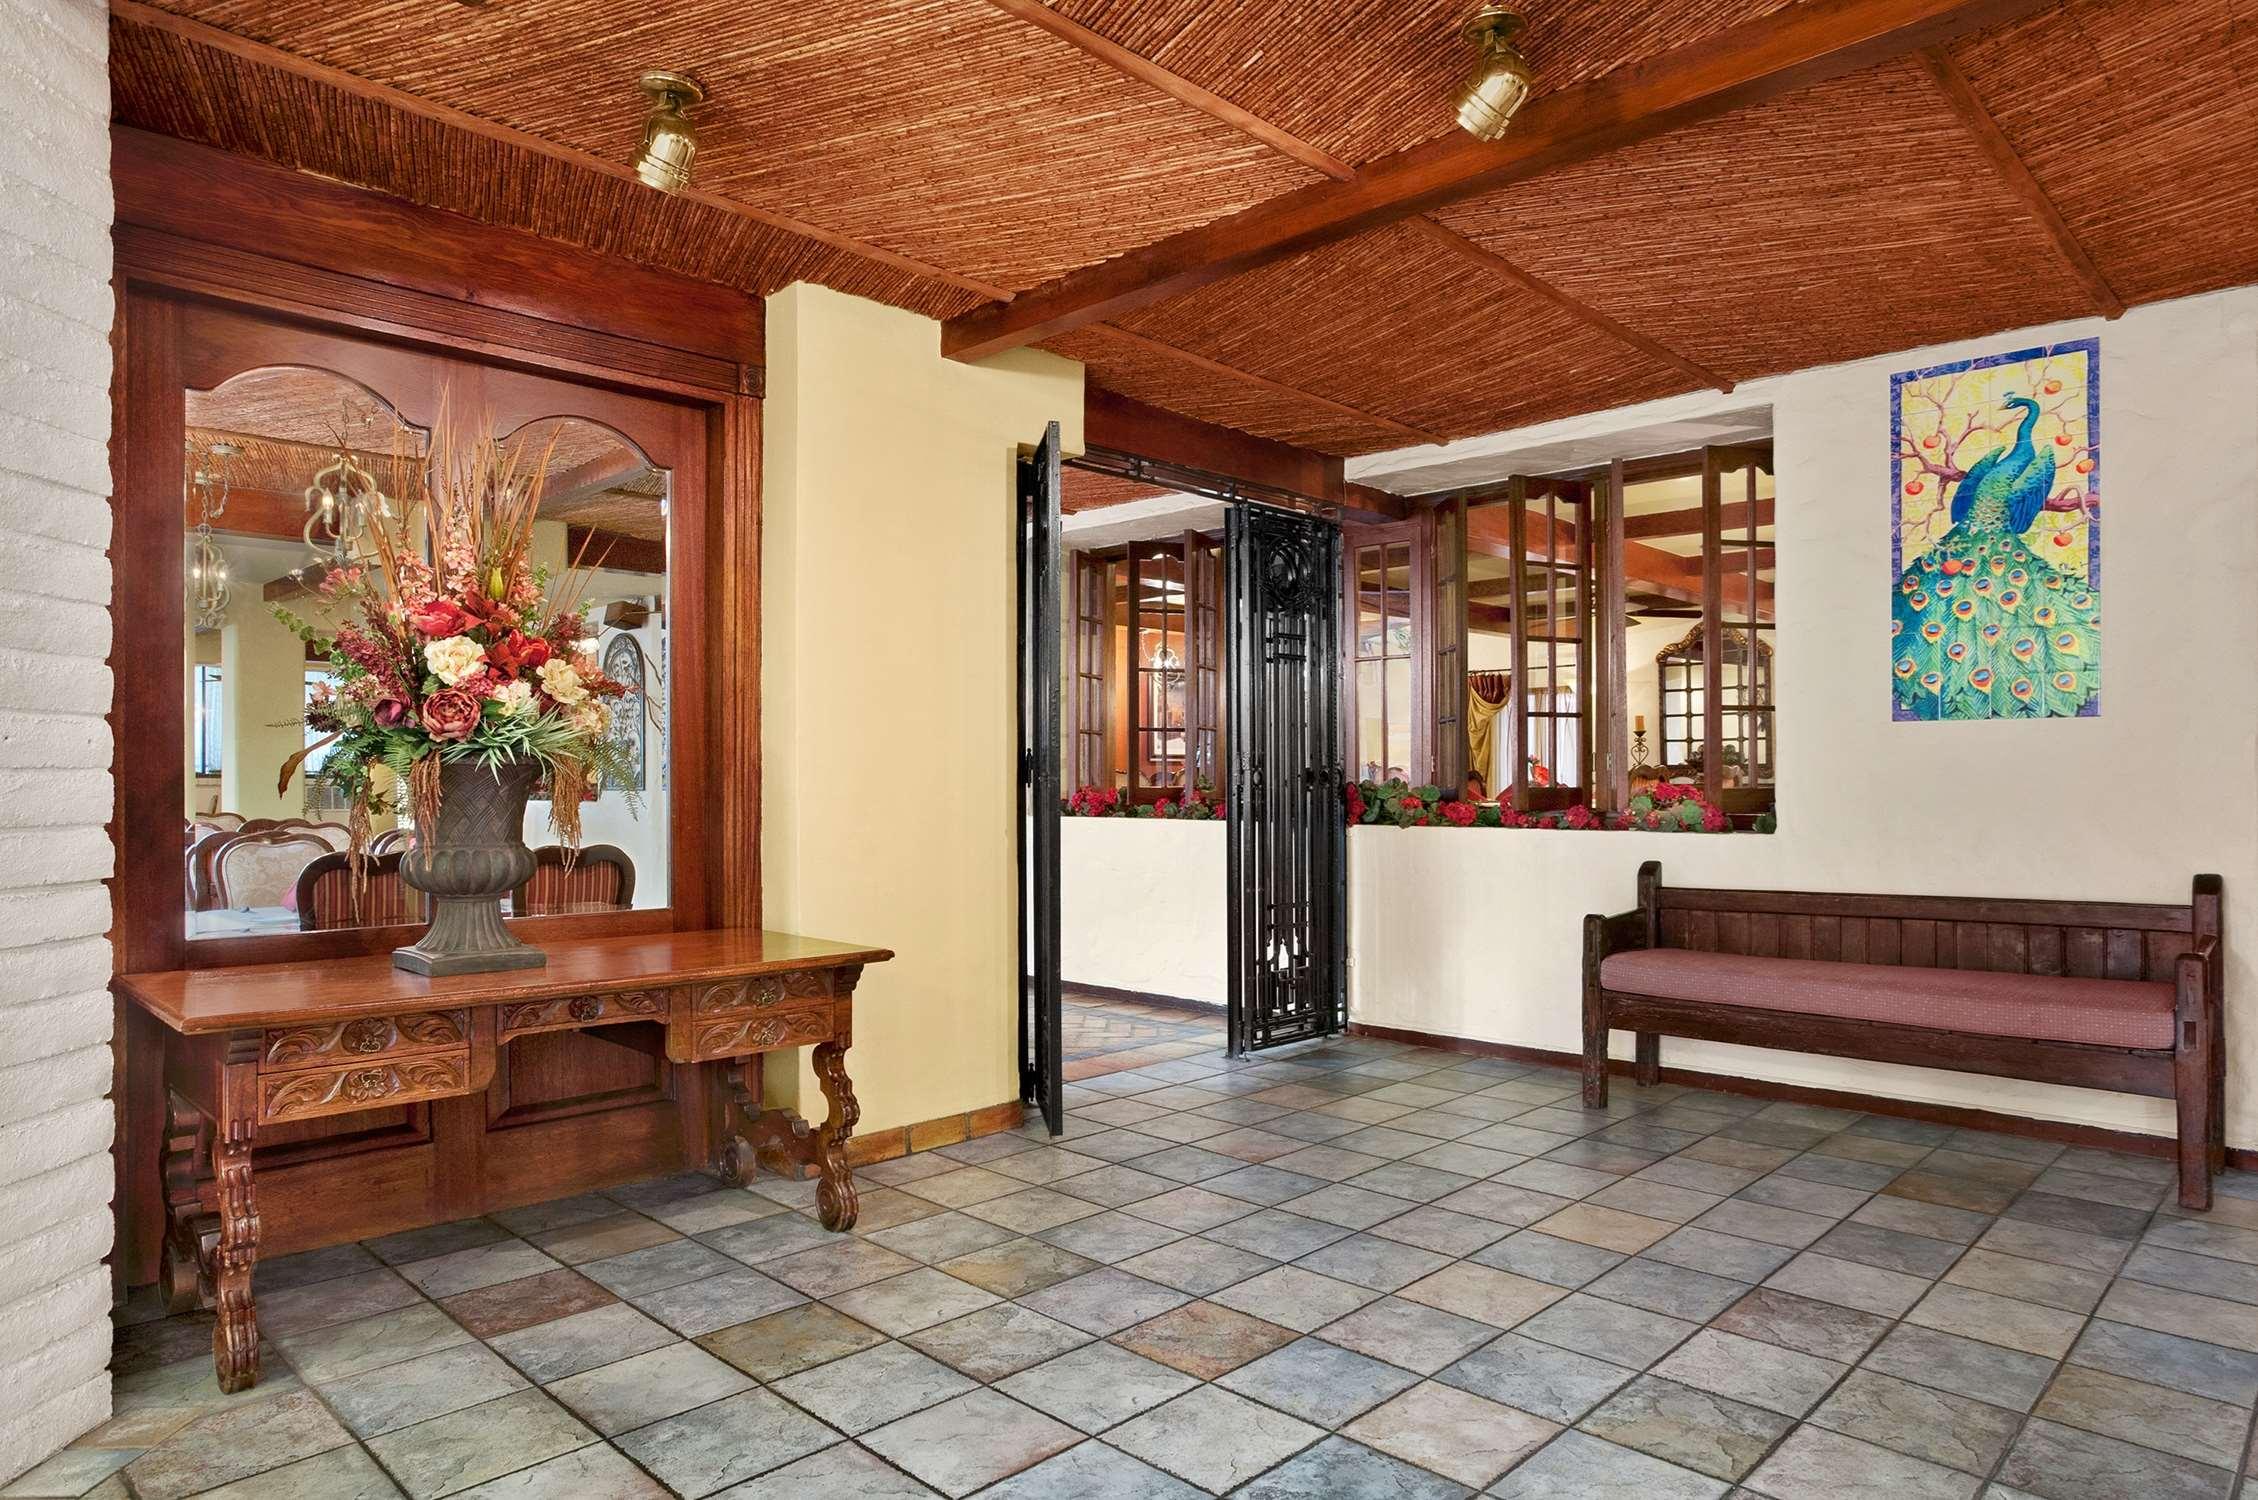 Embassy Suites by Hilton Arcadia Pasadena Area image 13